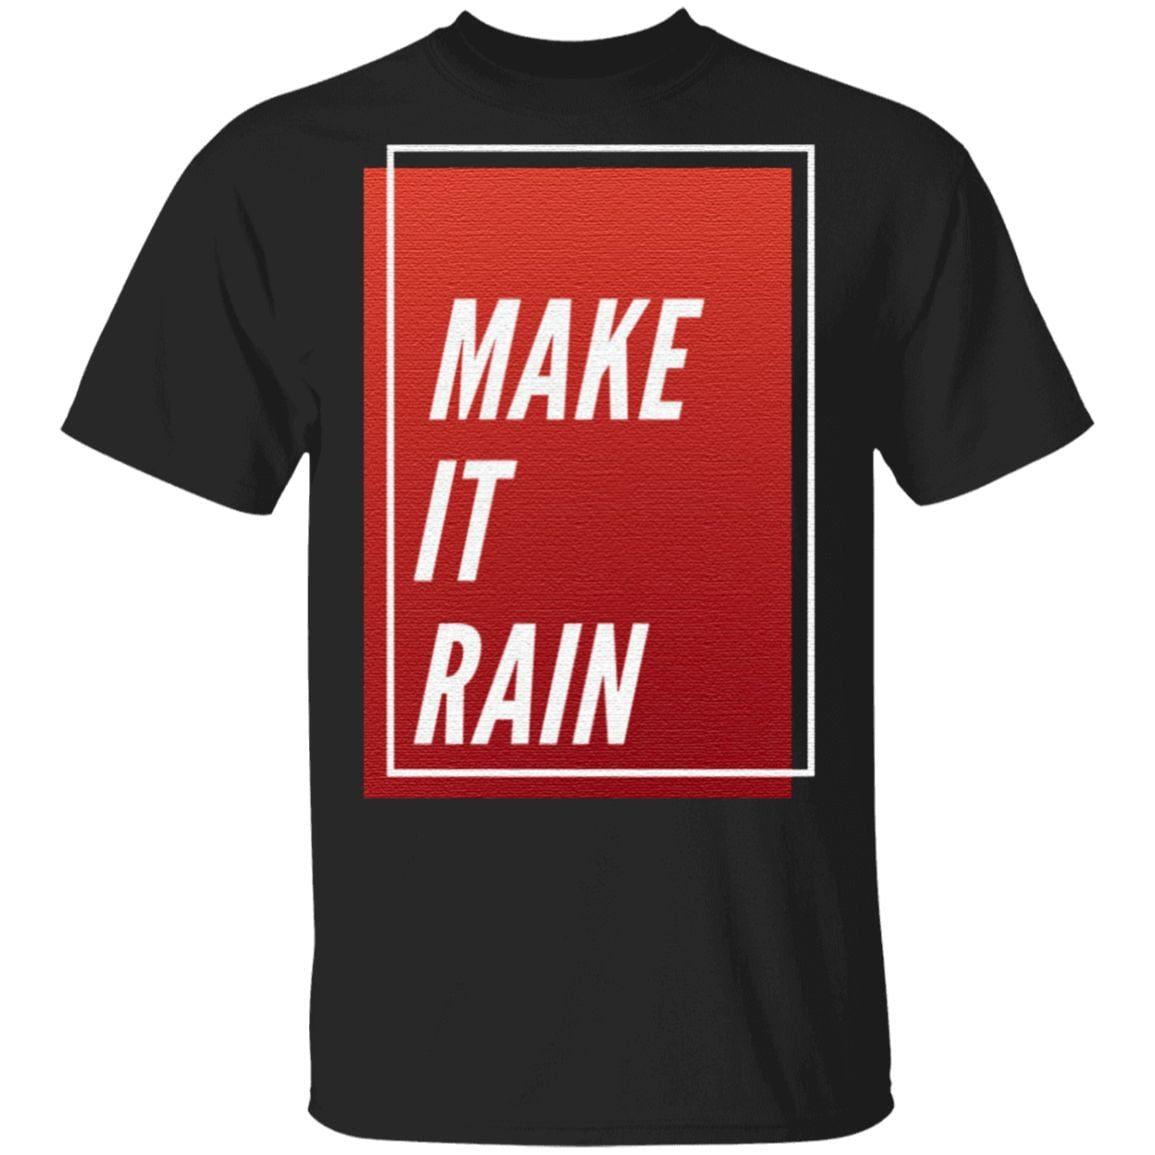 Make It Rain Trendy Quotes Gift T-Shirt